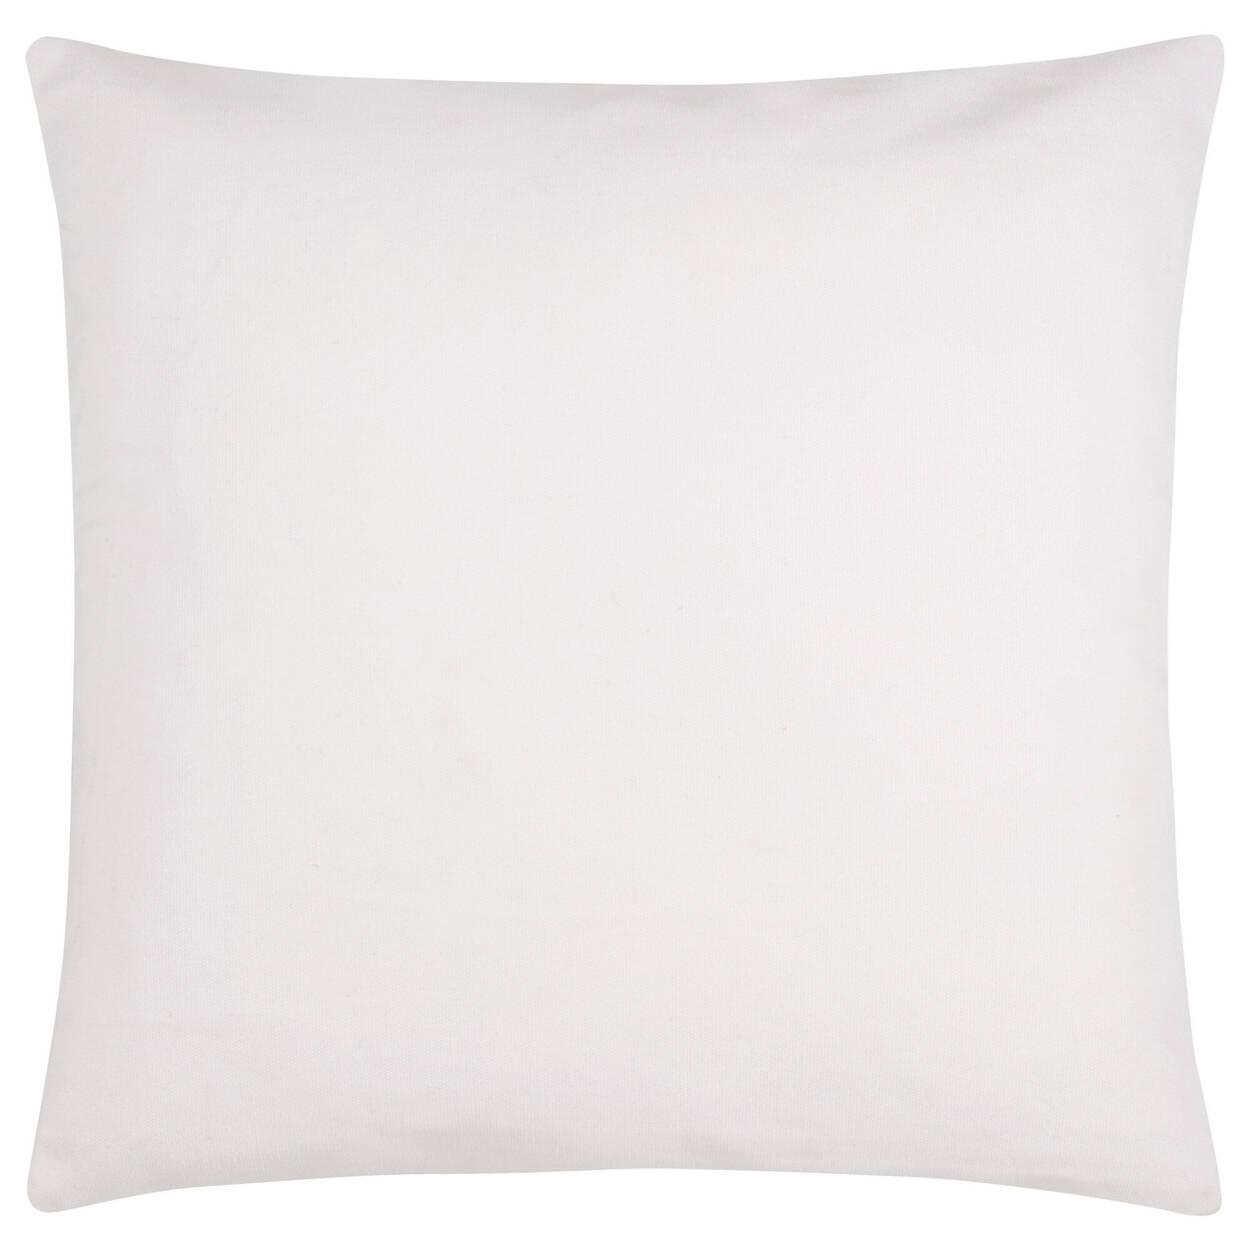 "Botany Decorative Pillow 19"" x 19"""